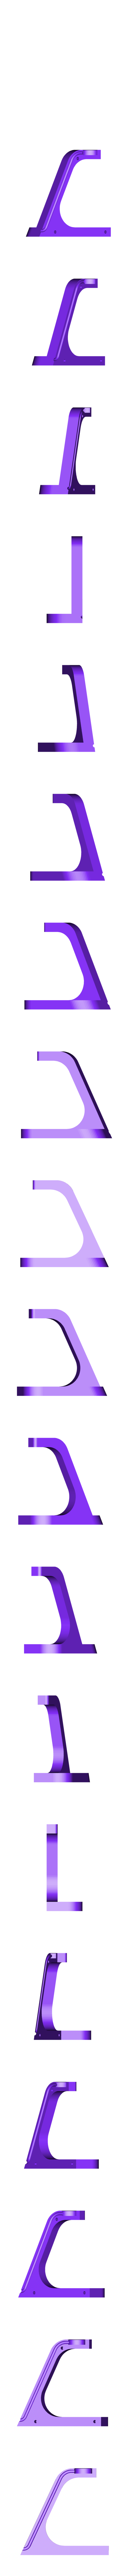 right__empty.stl Download free STL file Apple watch holder • 3D print object, mingyew